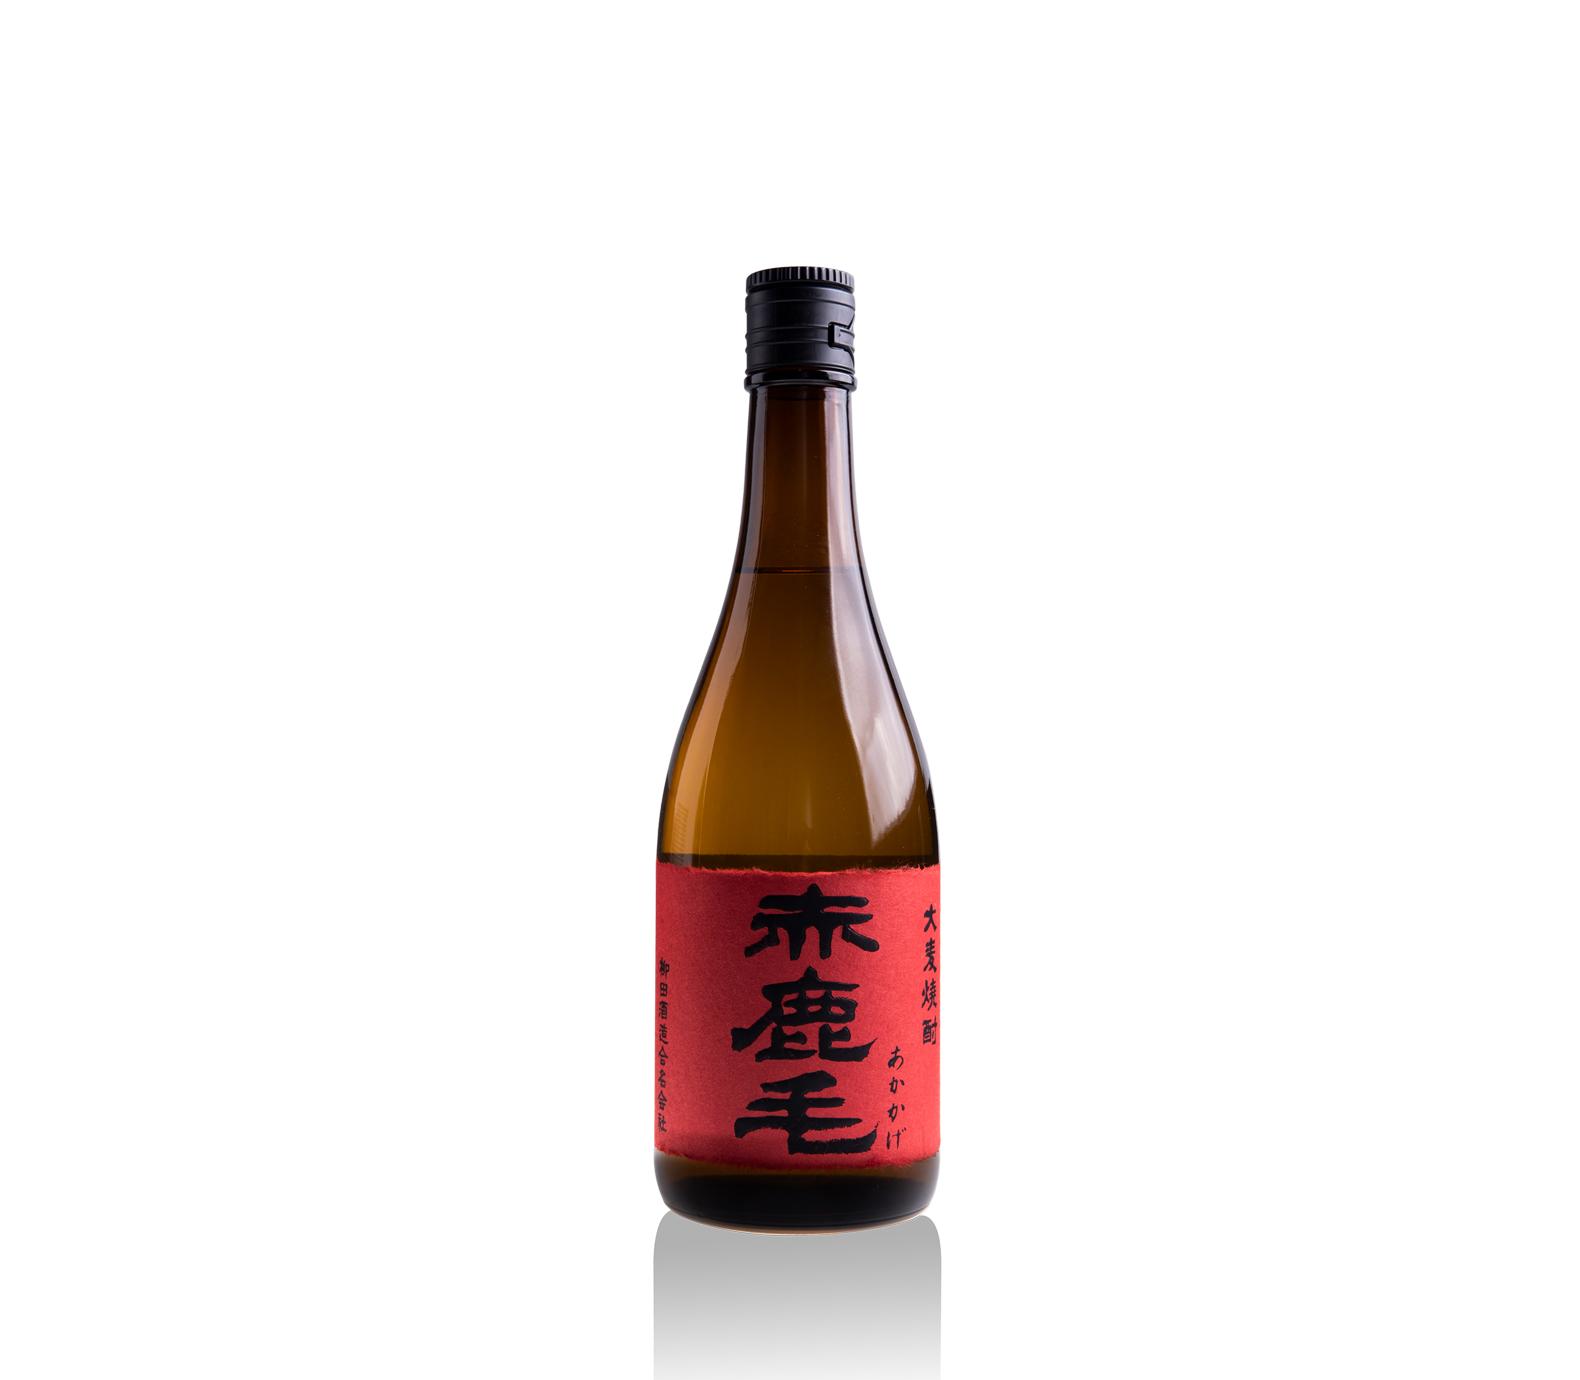 Yanagita Akakage (麦)赤鹿毛.jpg